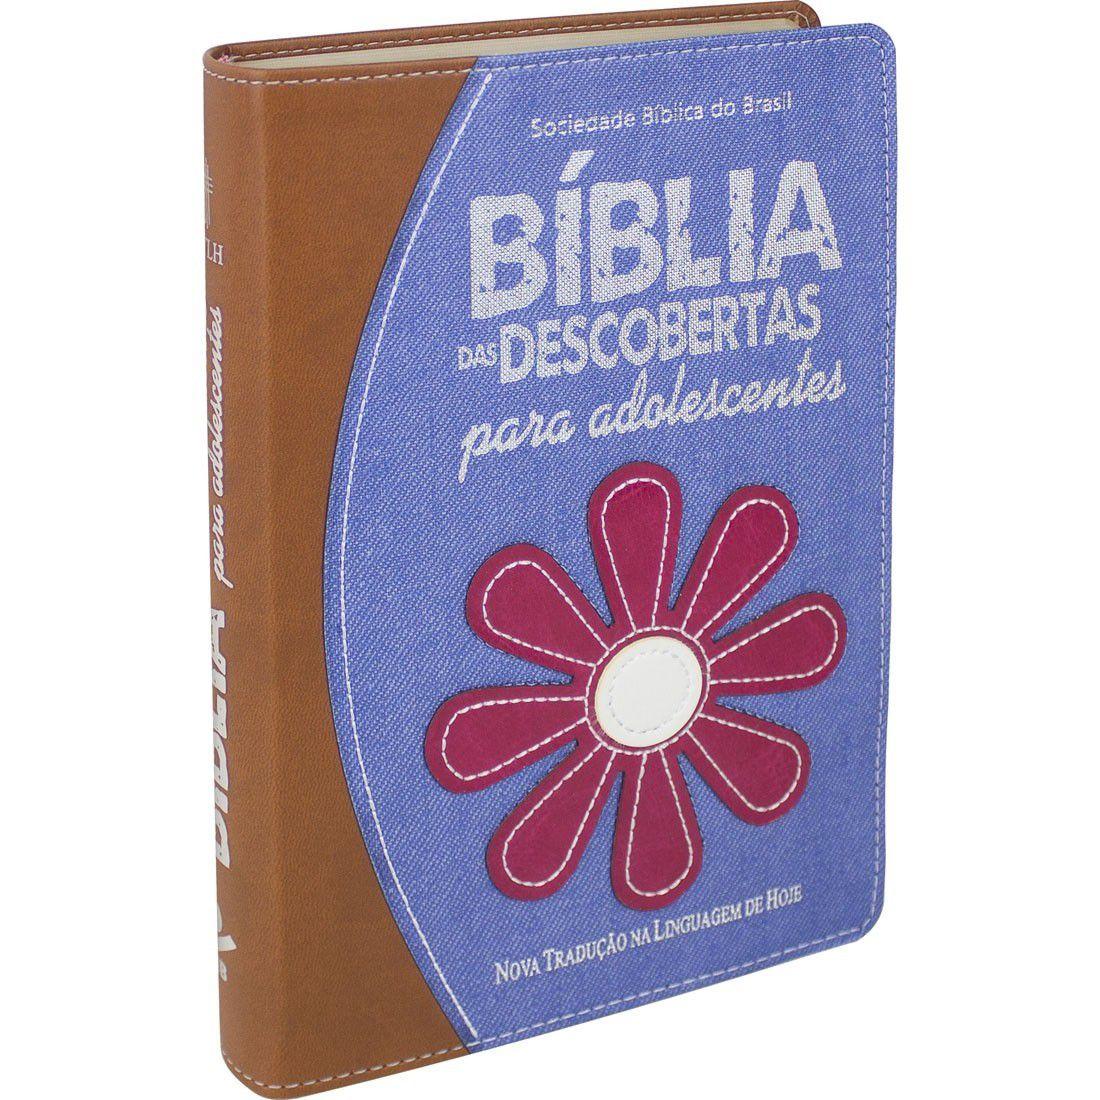 Bíblia das Descobertas Para Adolescentes - Capa Jeans